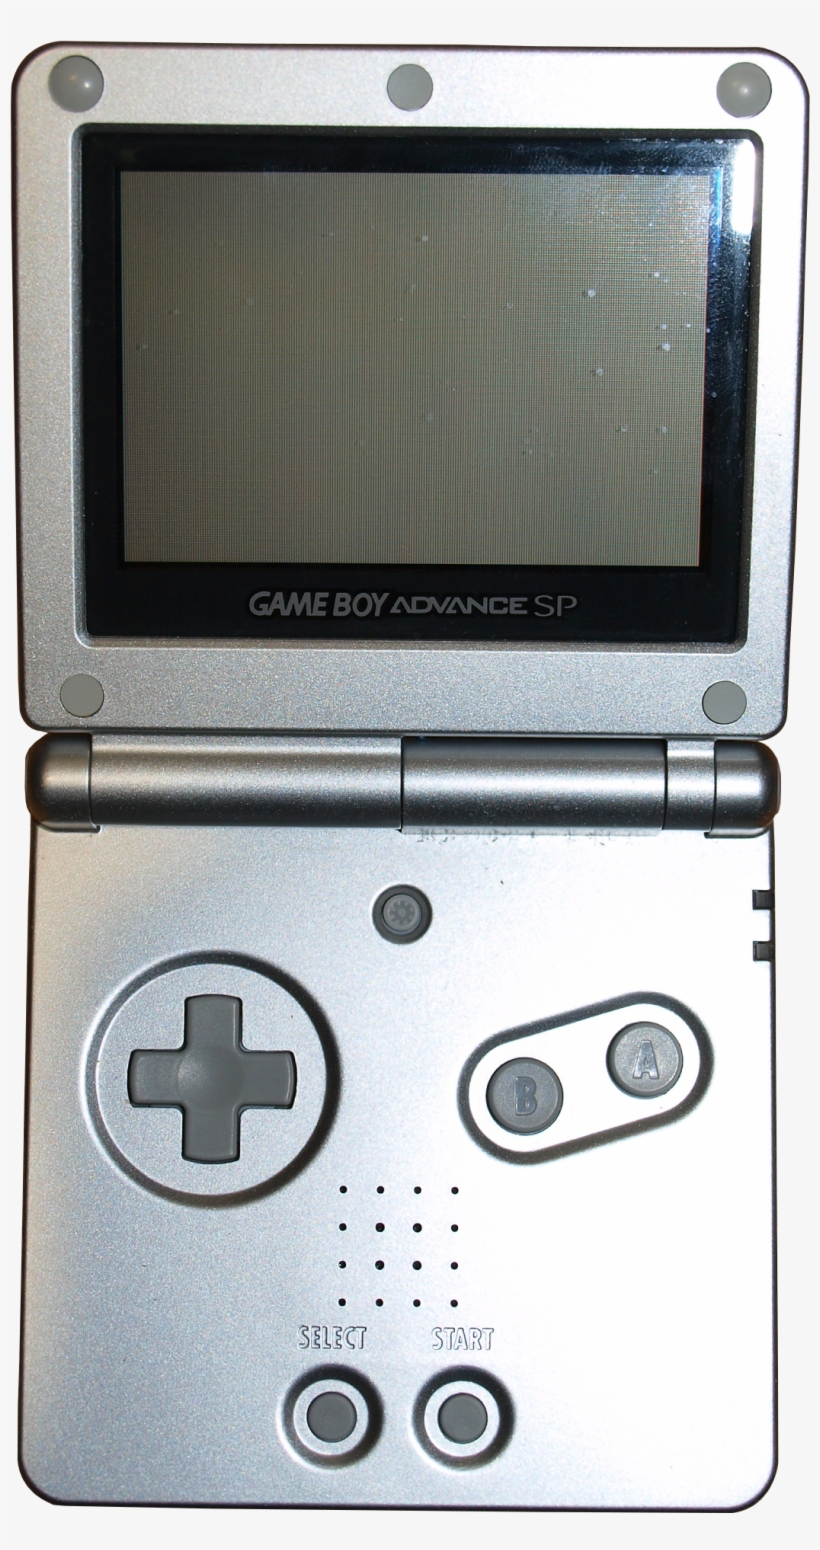 Gameboy-advance - Game Boy Advance Sp Transparent, transparent png #2216287